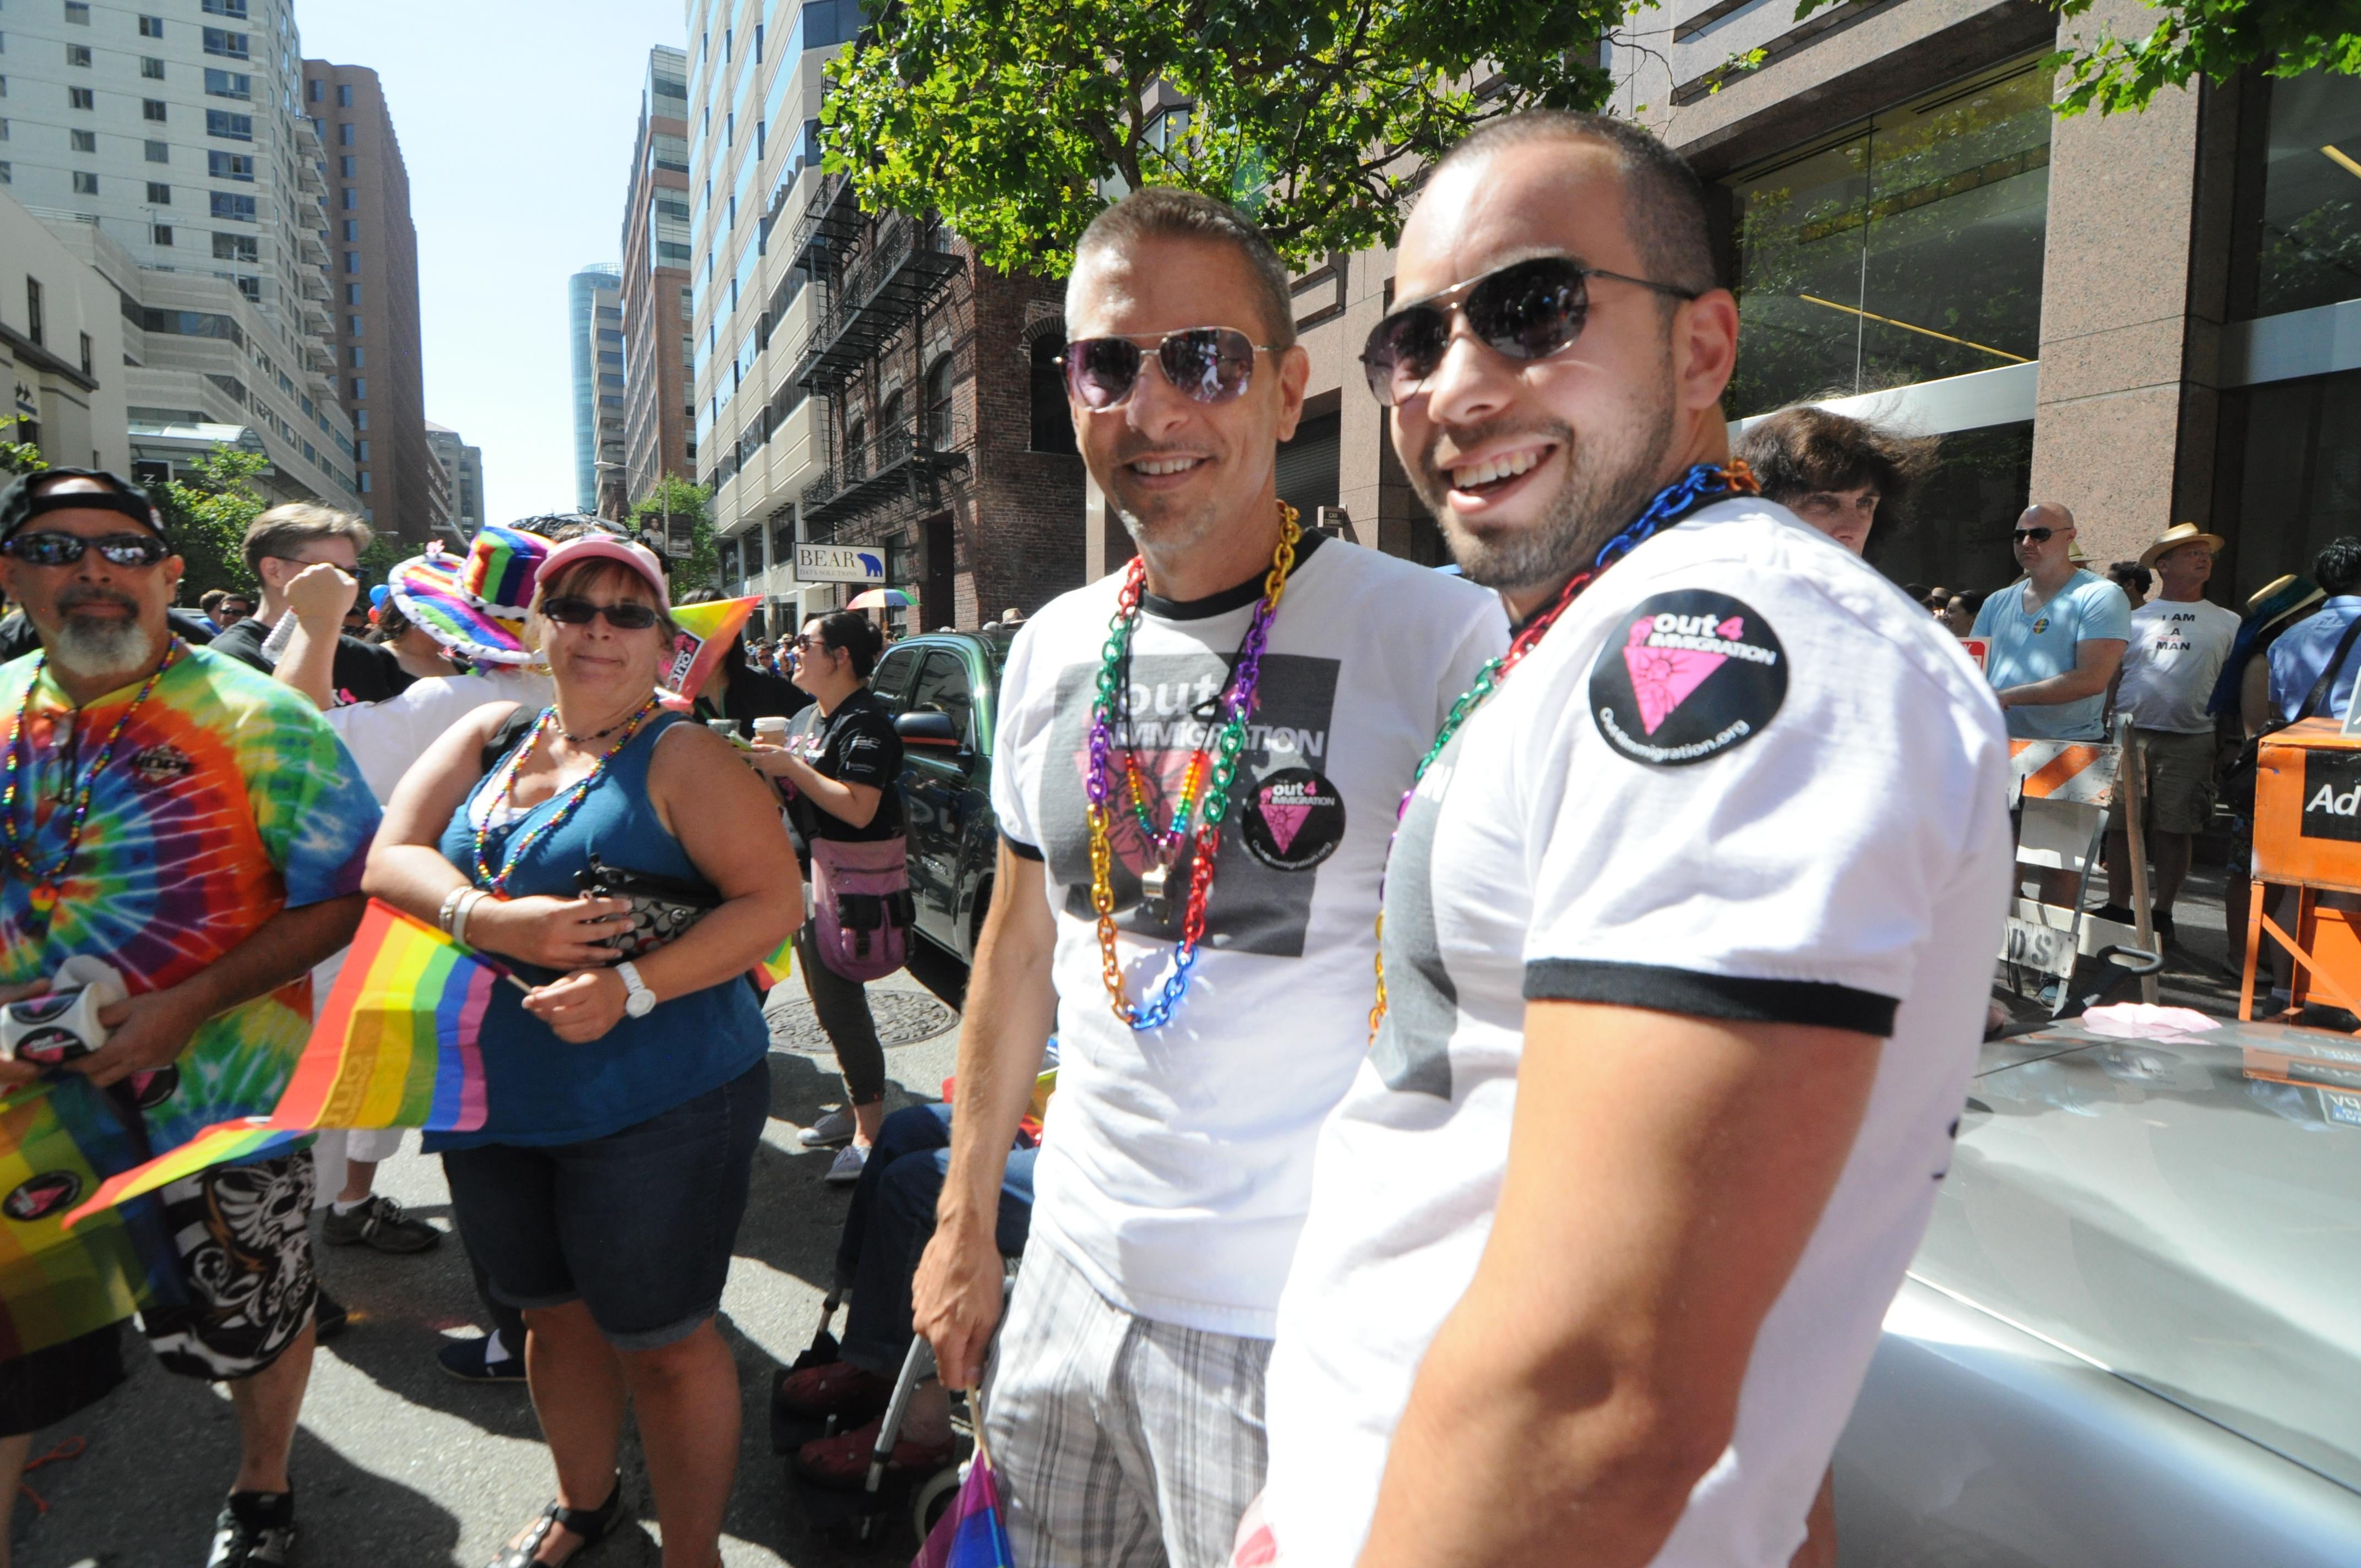 Gay Pride, LGTB and Medical Marijuana